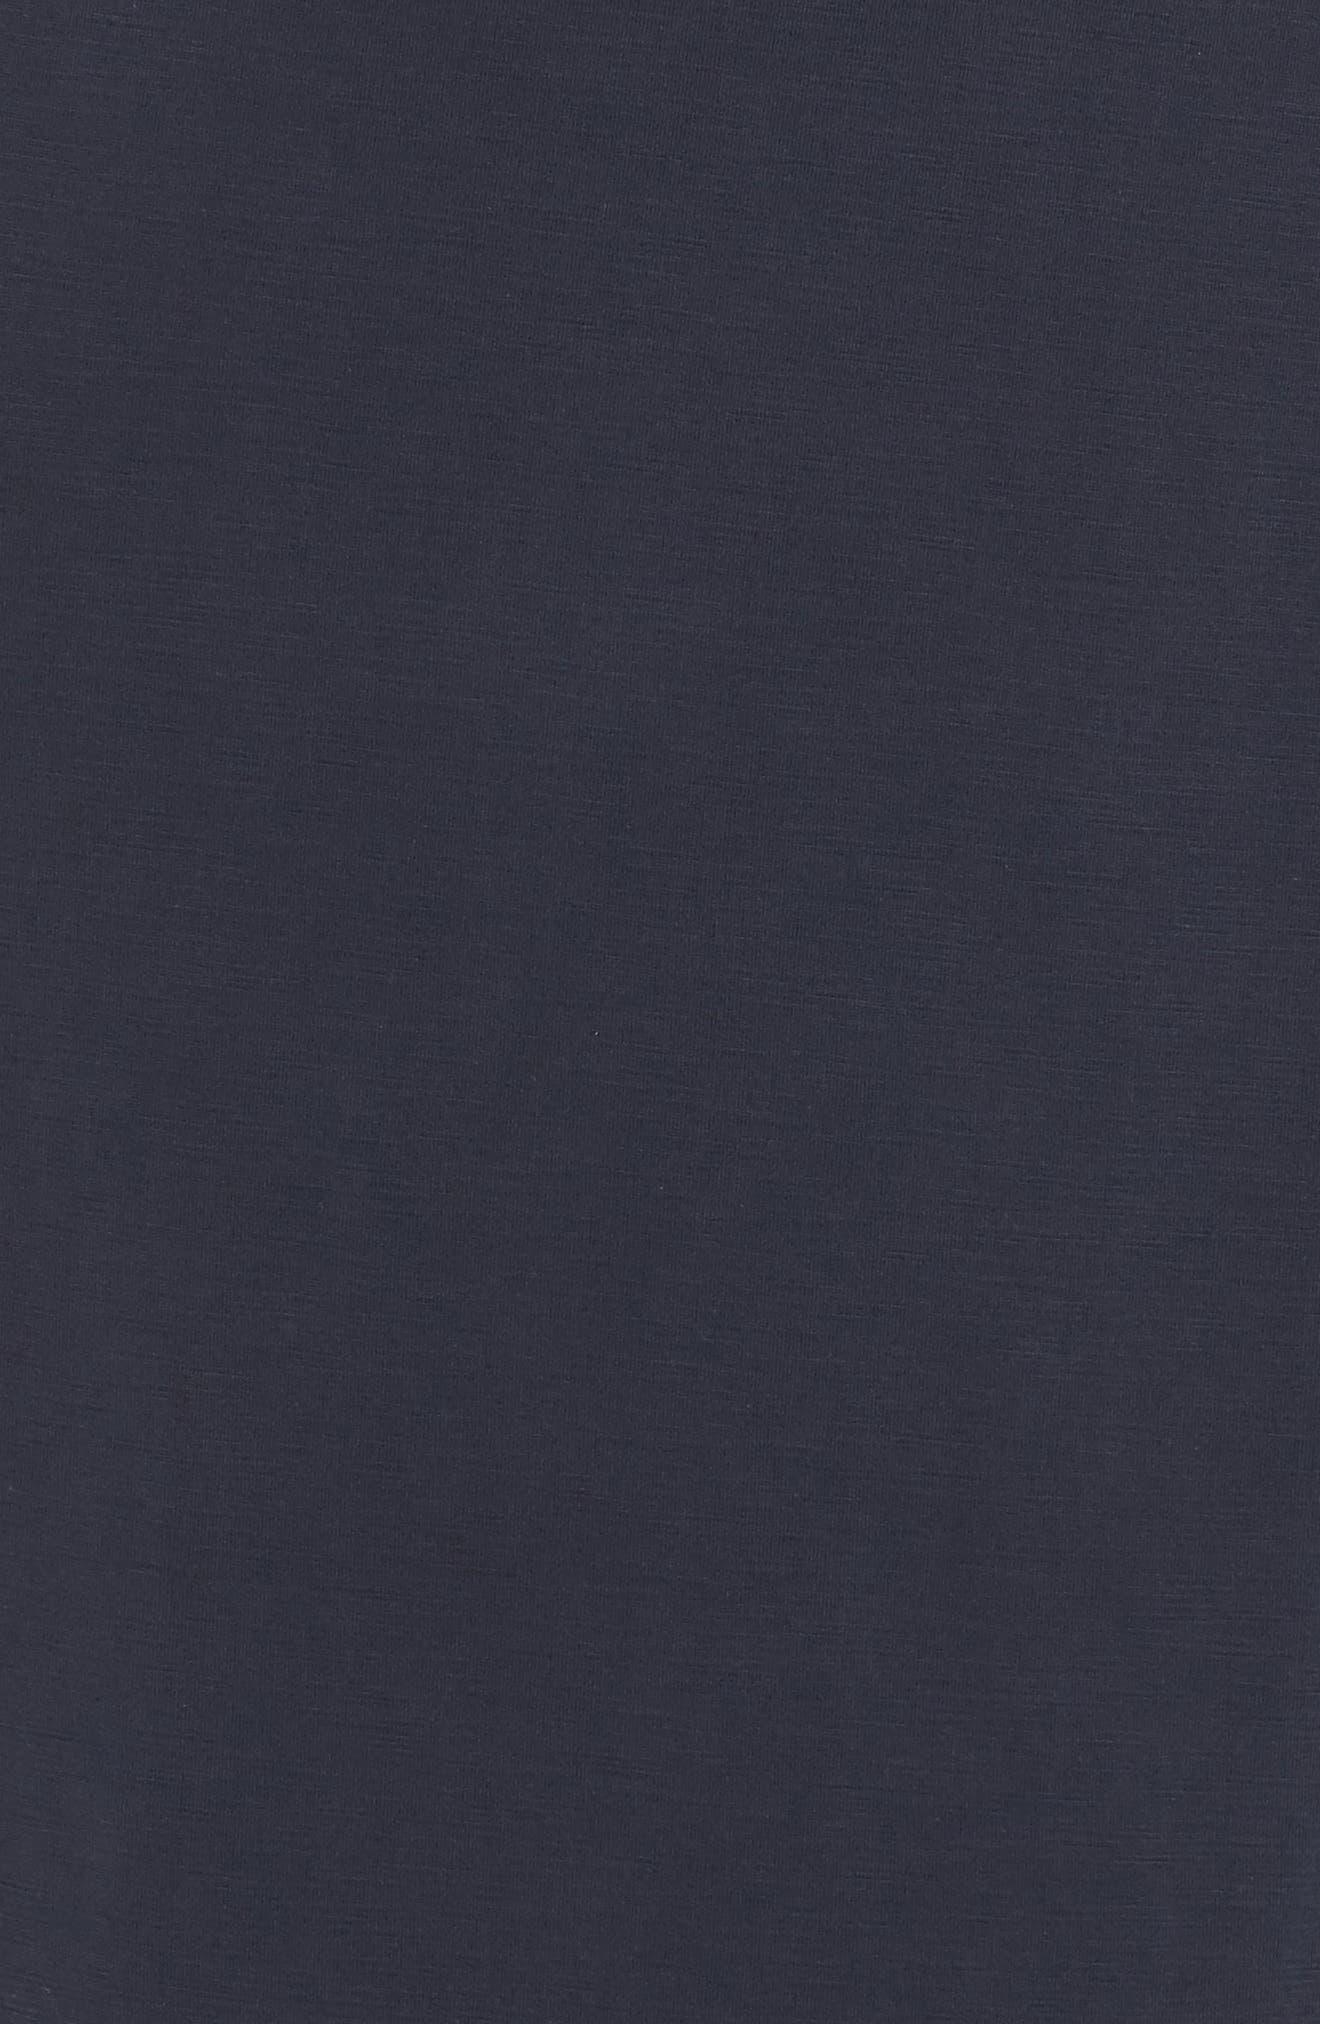 Boardwalk Knit Wrap Maxi Skirt,                             Alternate thumbnail 10, color,